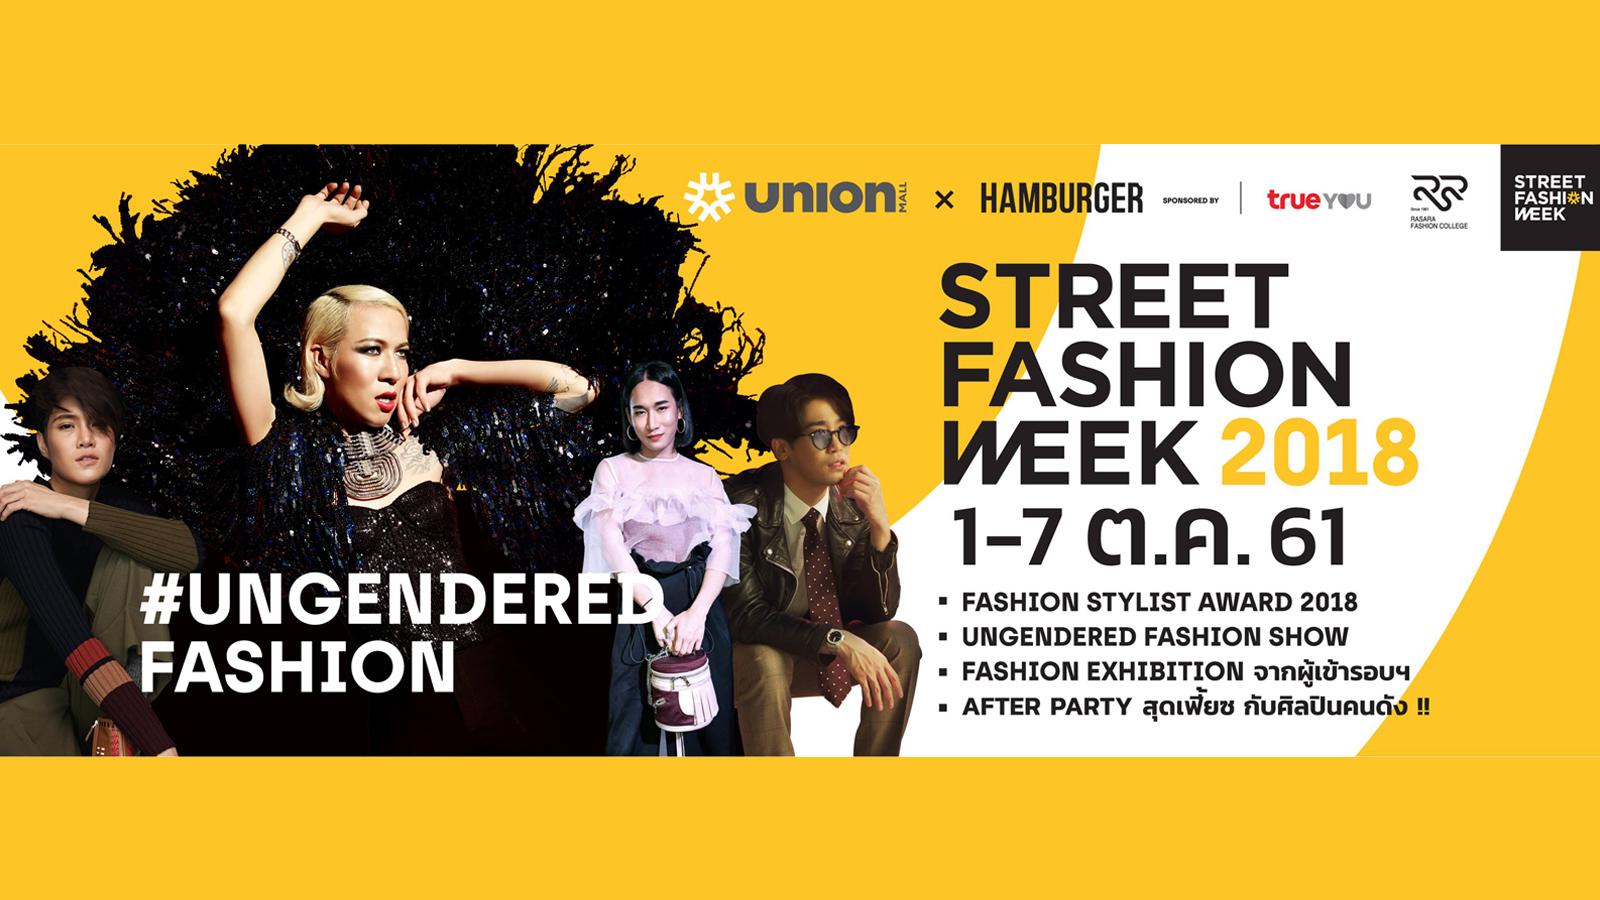 Union Mall STREET FASHION WEEK 2018